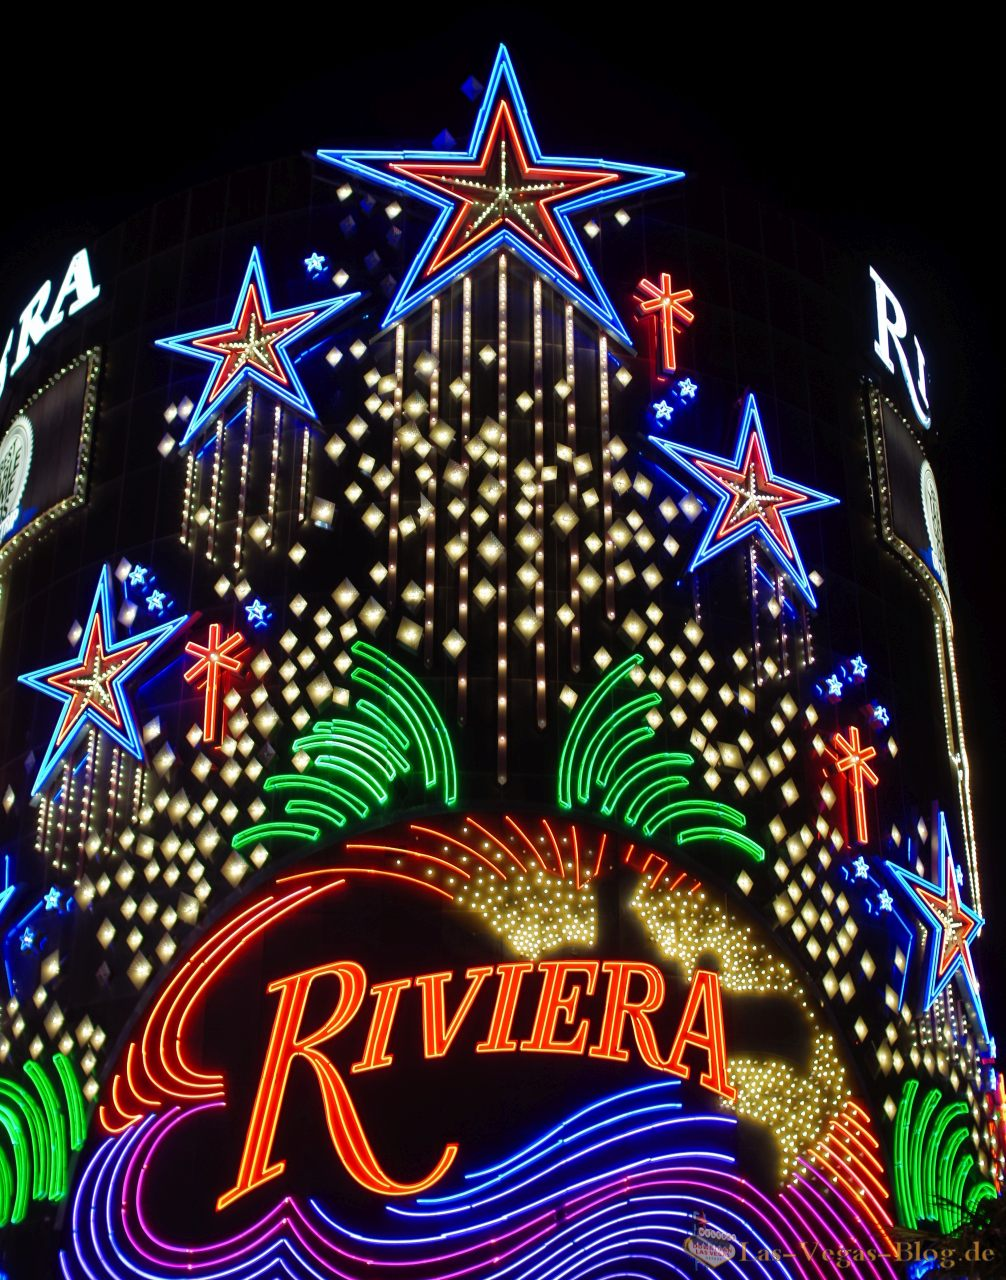 Flamingo hotel las vegas bei nacht aus dem heliopter - Riviera Hotel Las Vegas Beleuchtung